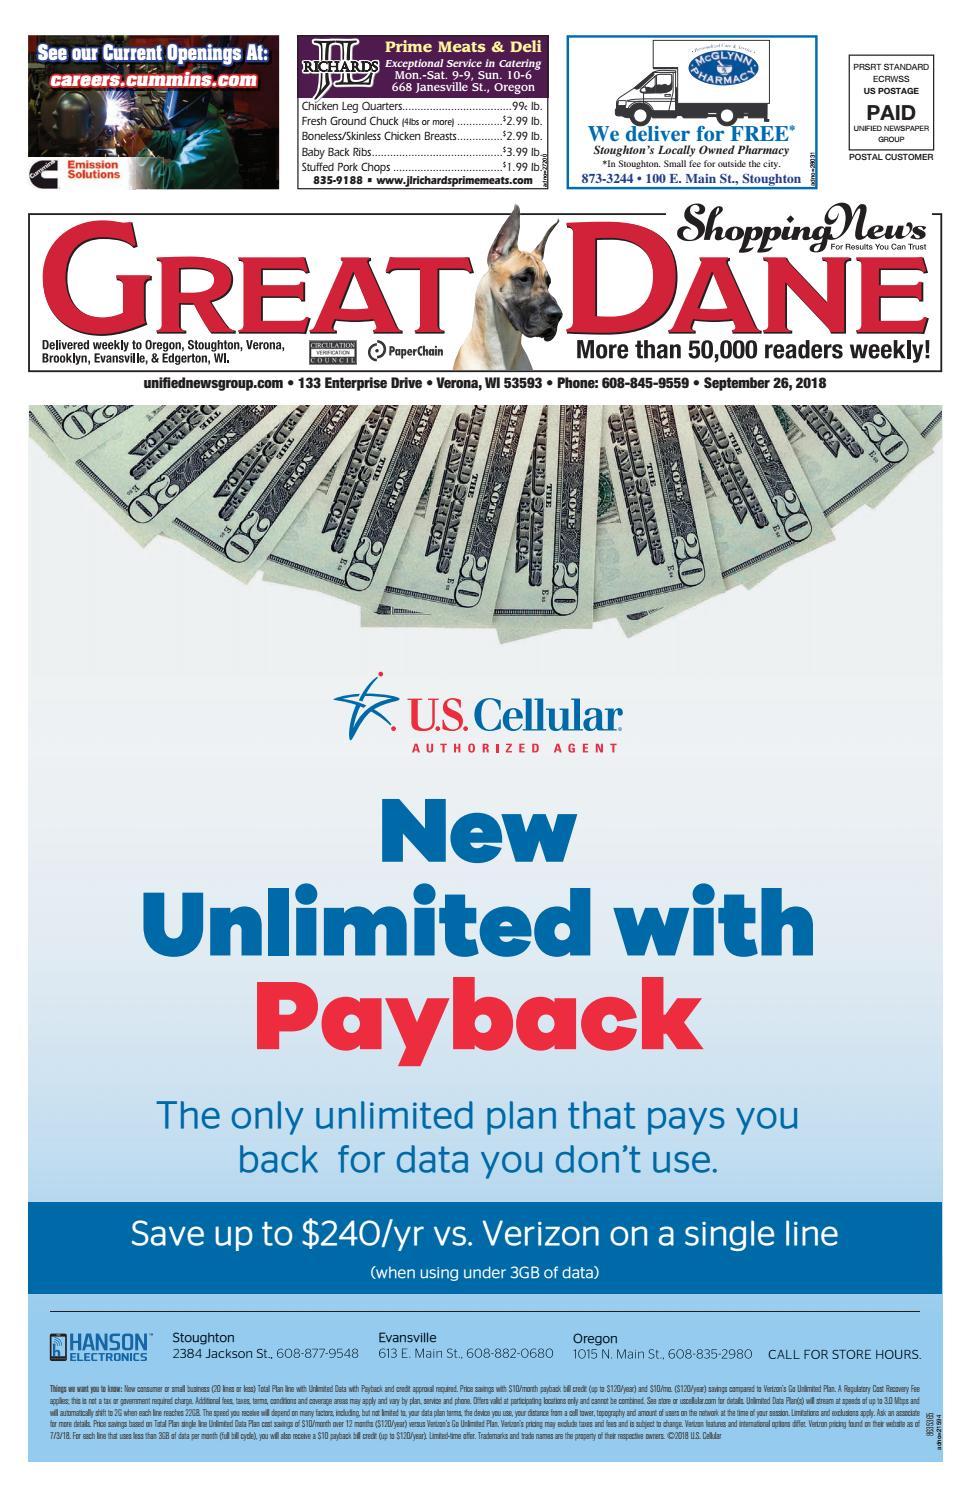 9/26/18 Great Dane Shopping News by Woodward Community Media